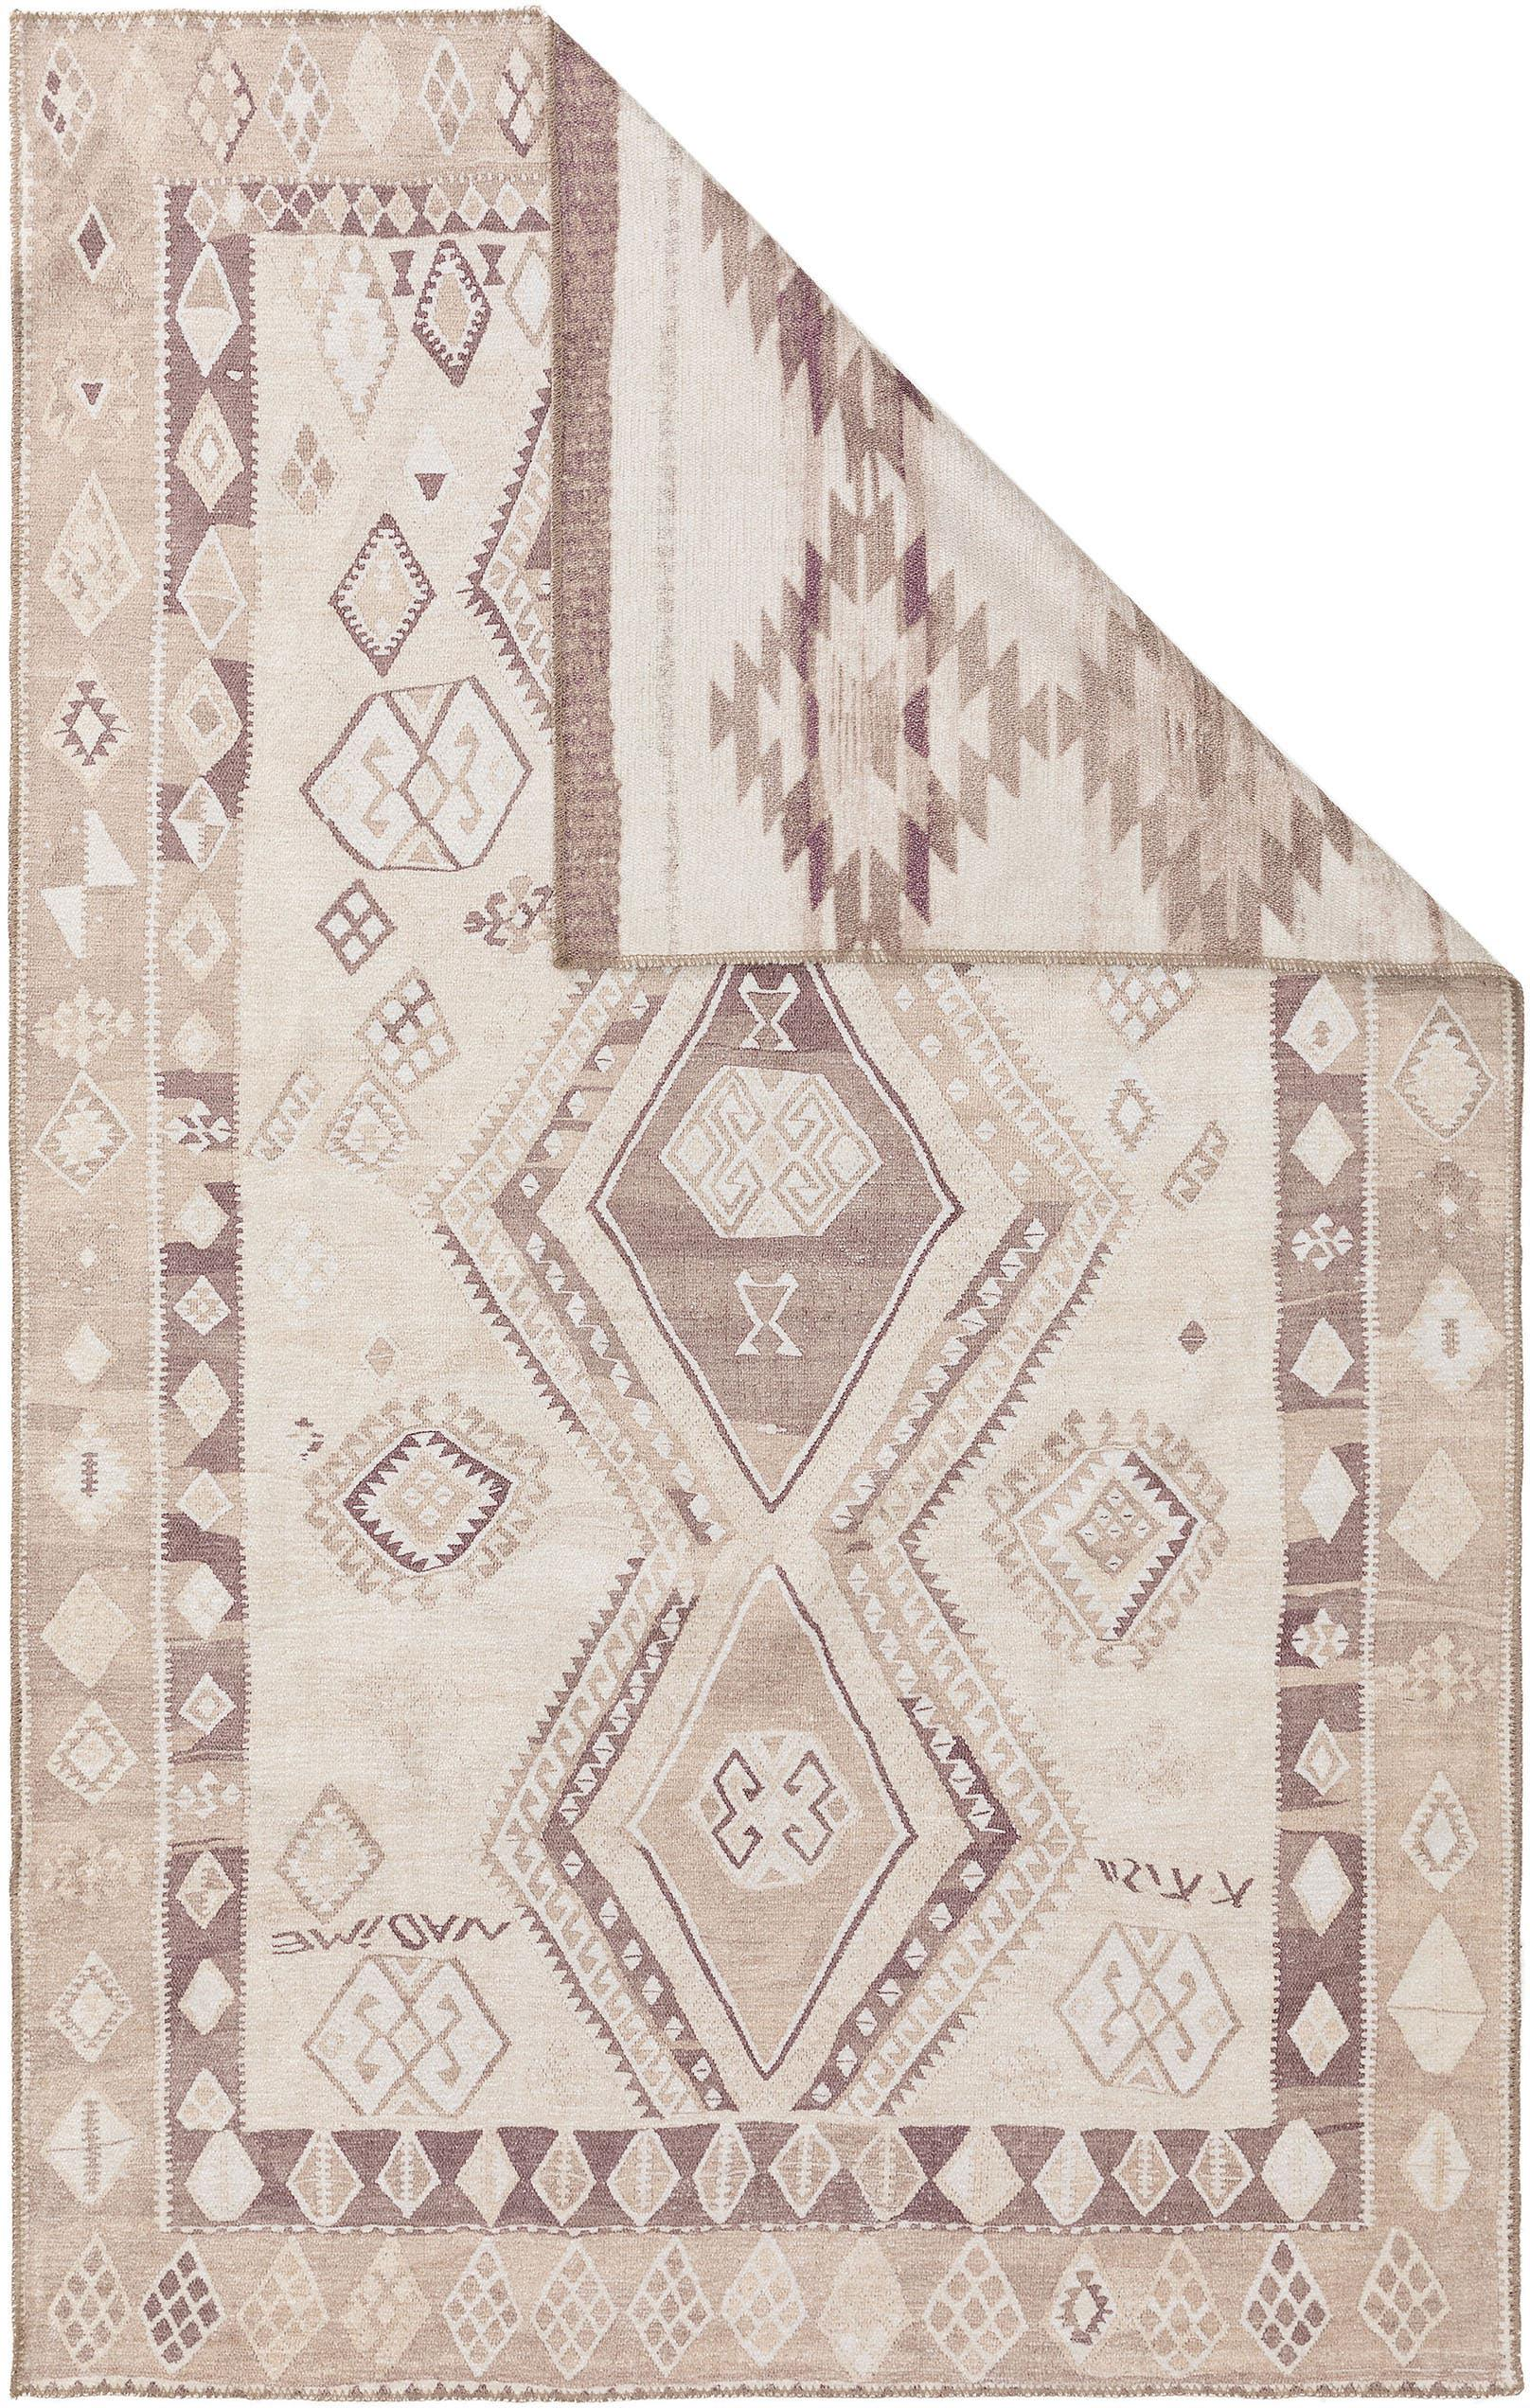 Tappeto reversibile kilim Ana Aztec, 80% poliestere 20% cotone, Beige, taupe, Larg. 75 x Lung. 150 cm (taglia XS)